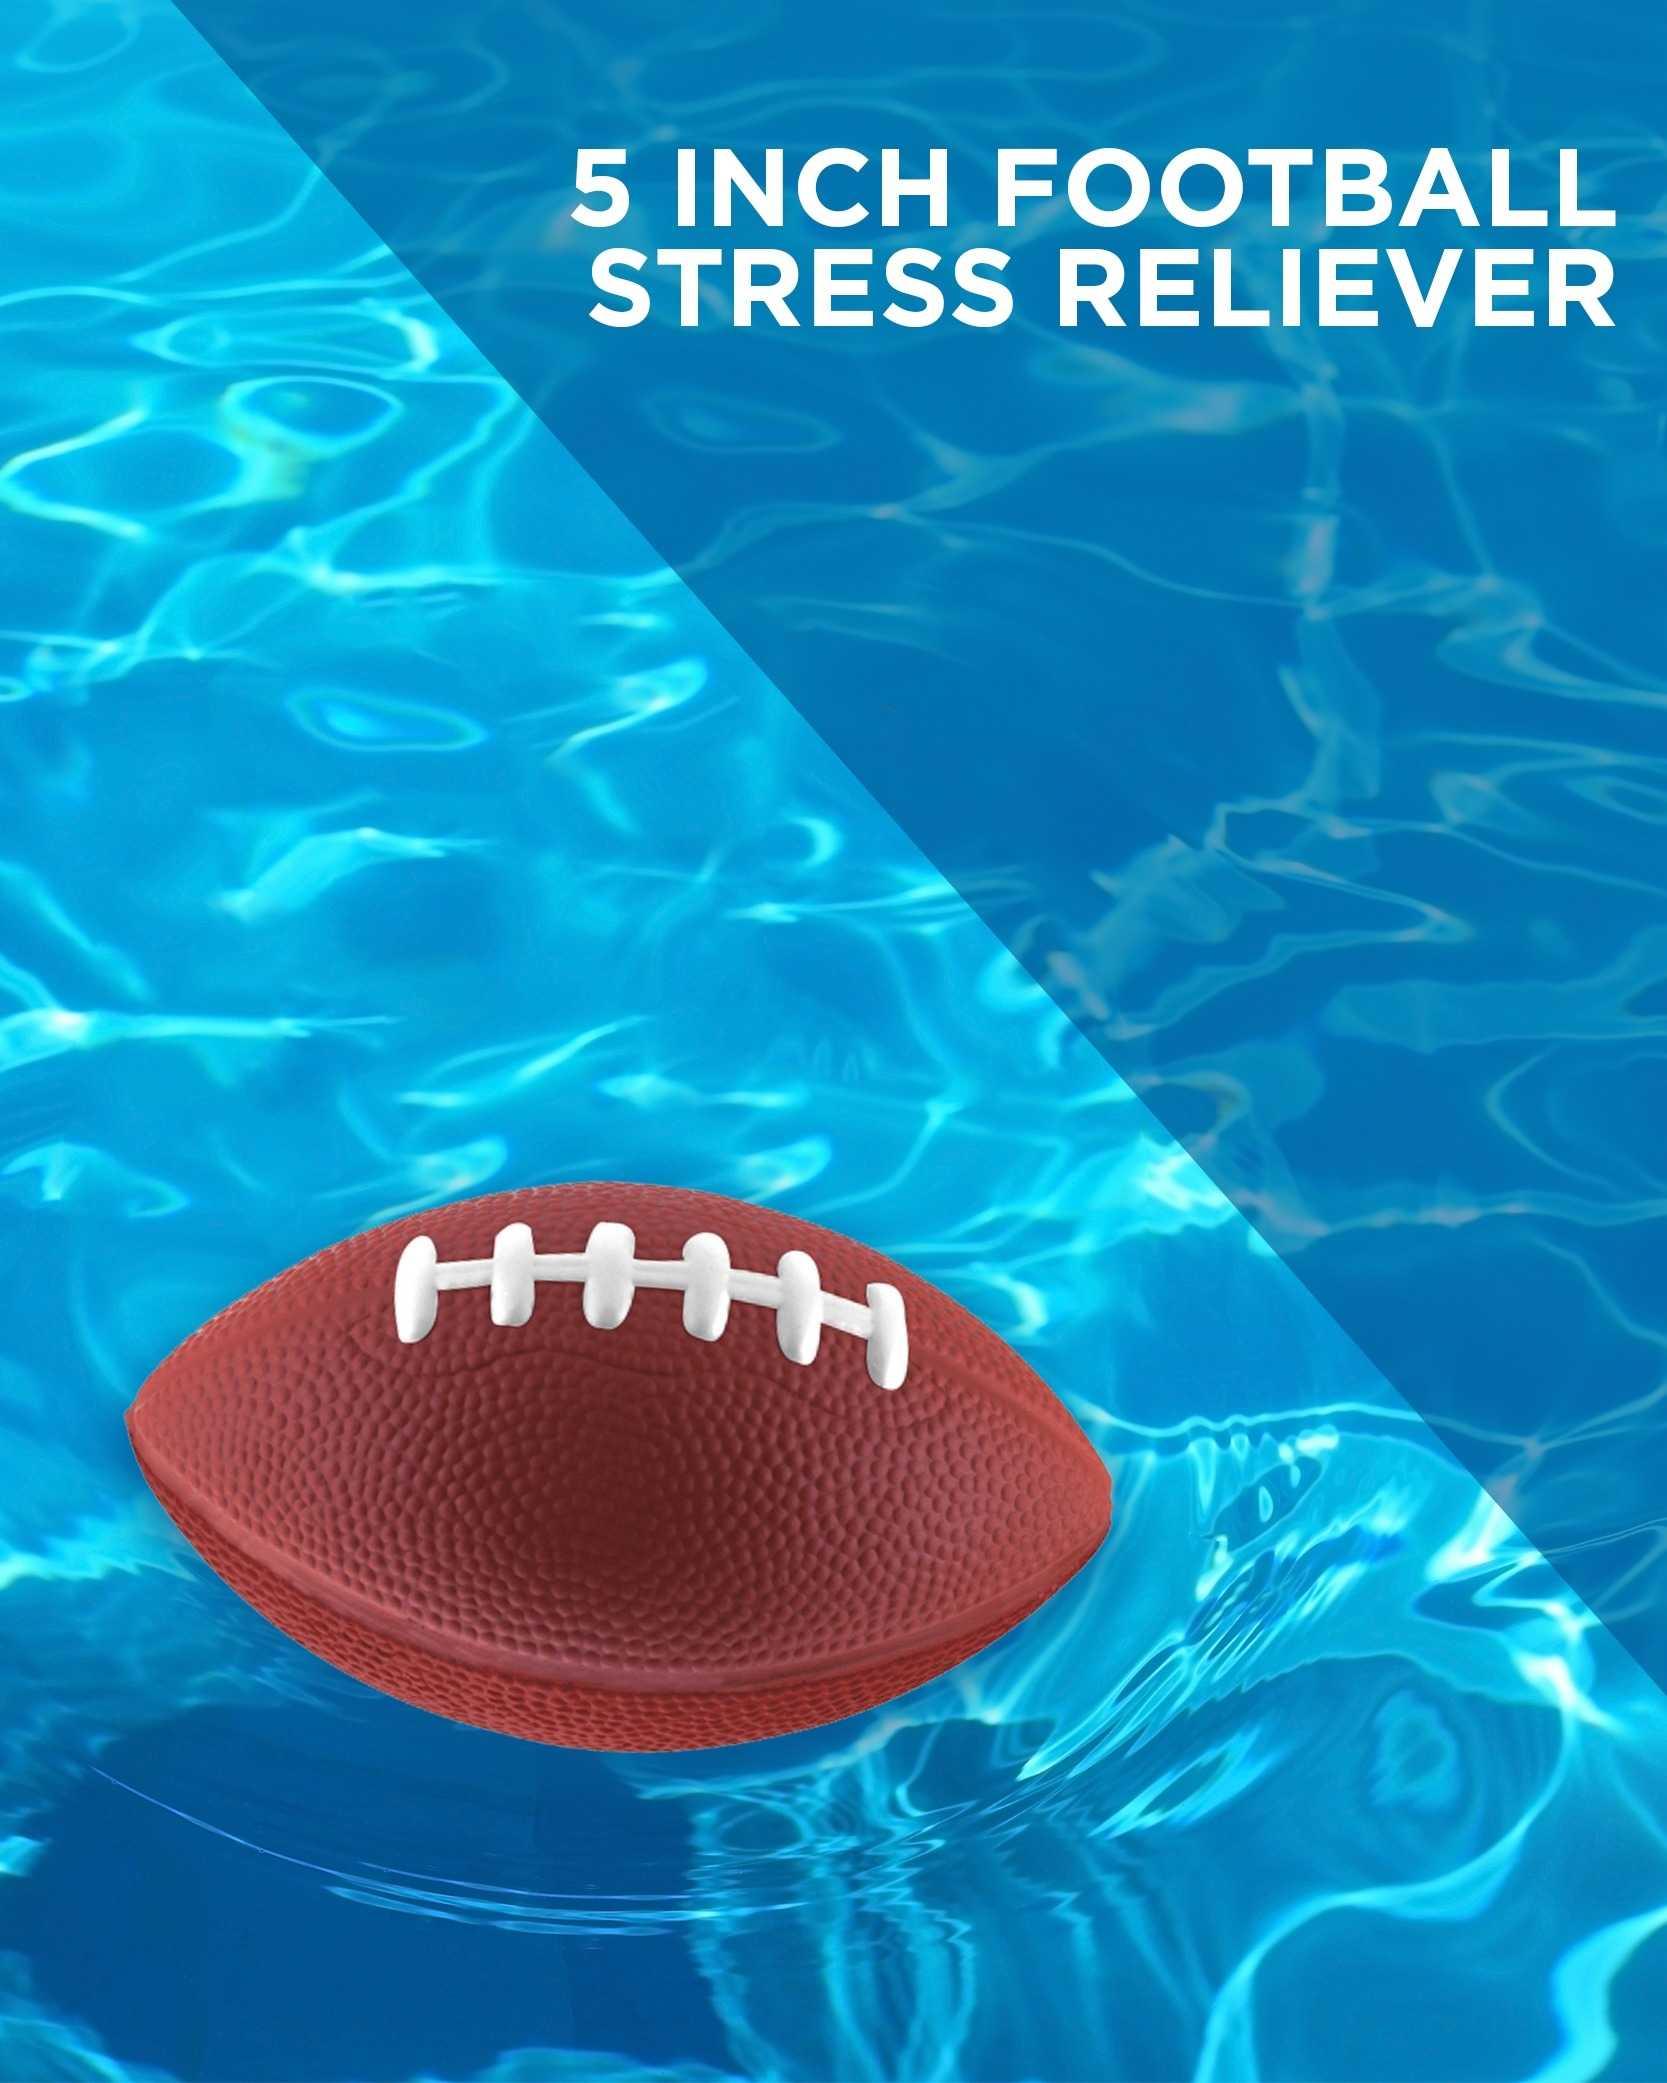 Stress Reliever AIM